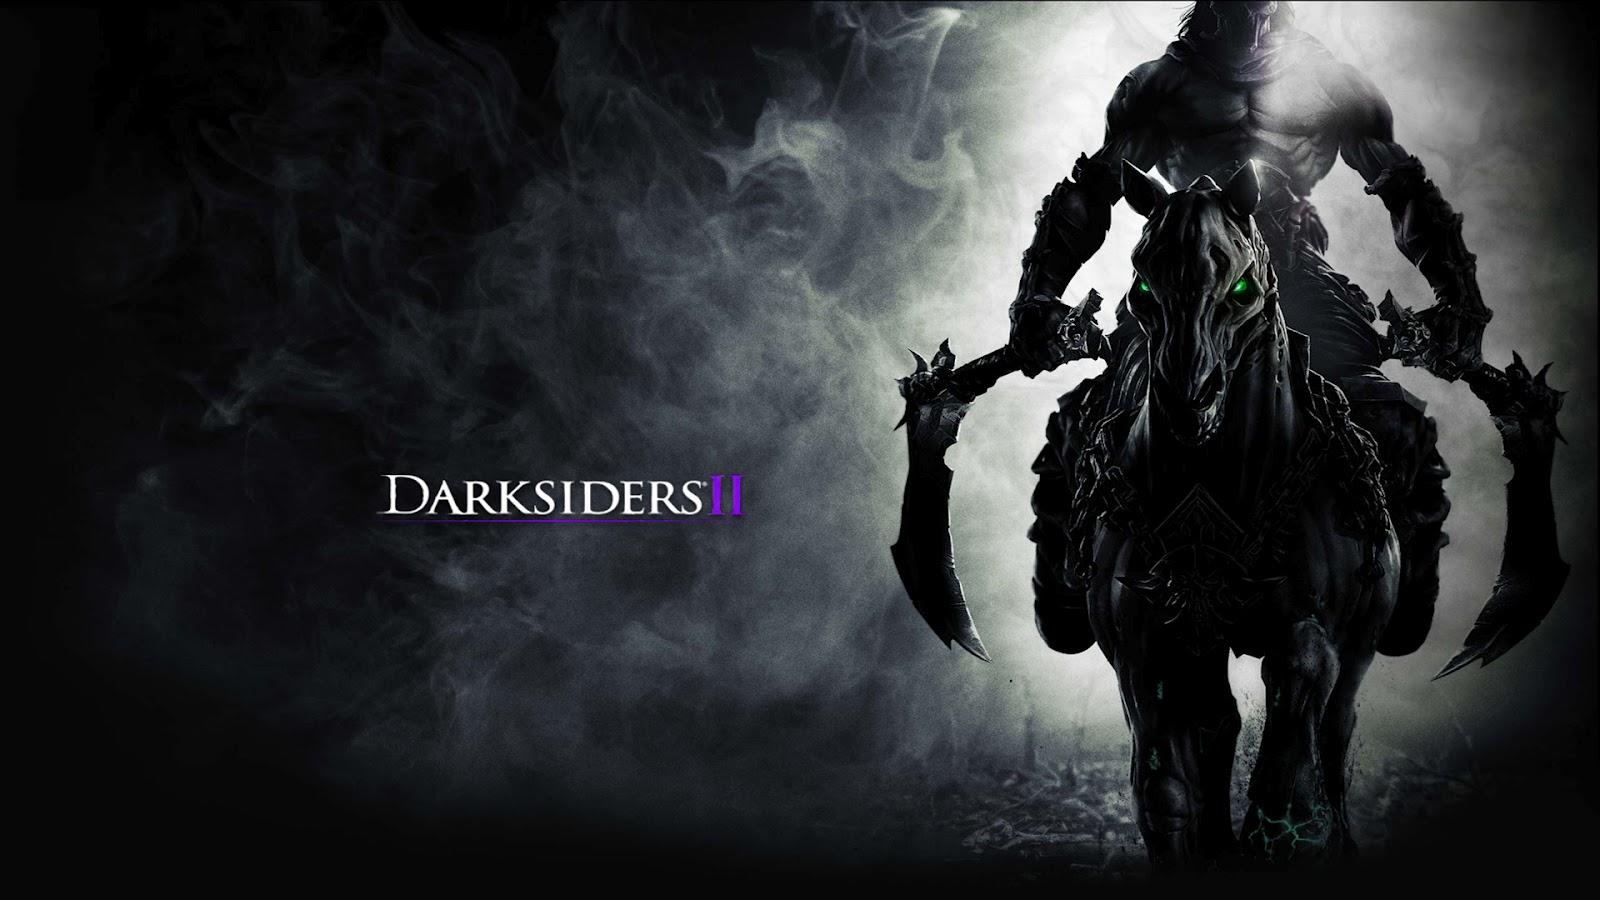 Cool   Wallpaper Horse Gothic - darksiders_2___death_rides%2BPiCsHoliC  Graphic_917543.jpg